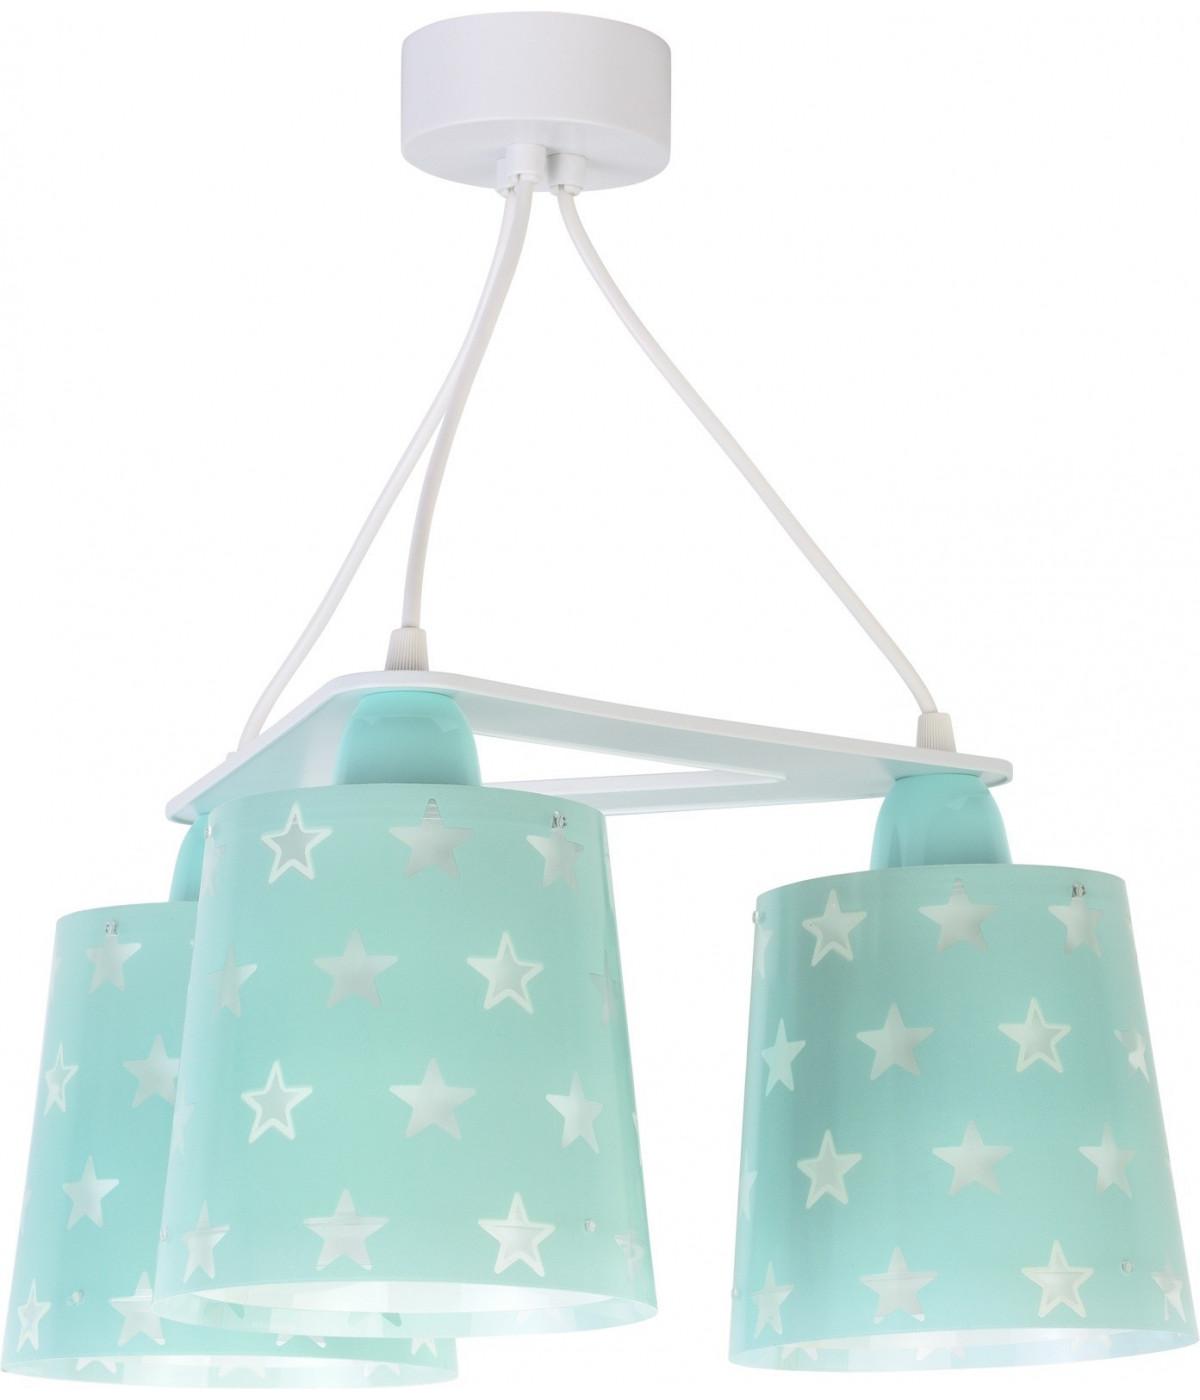 3 light Kids Hanging lamp Stars green